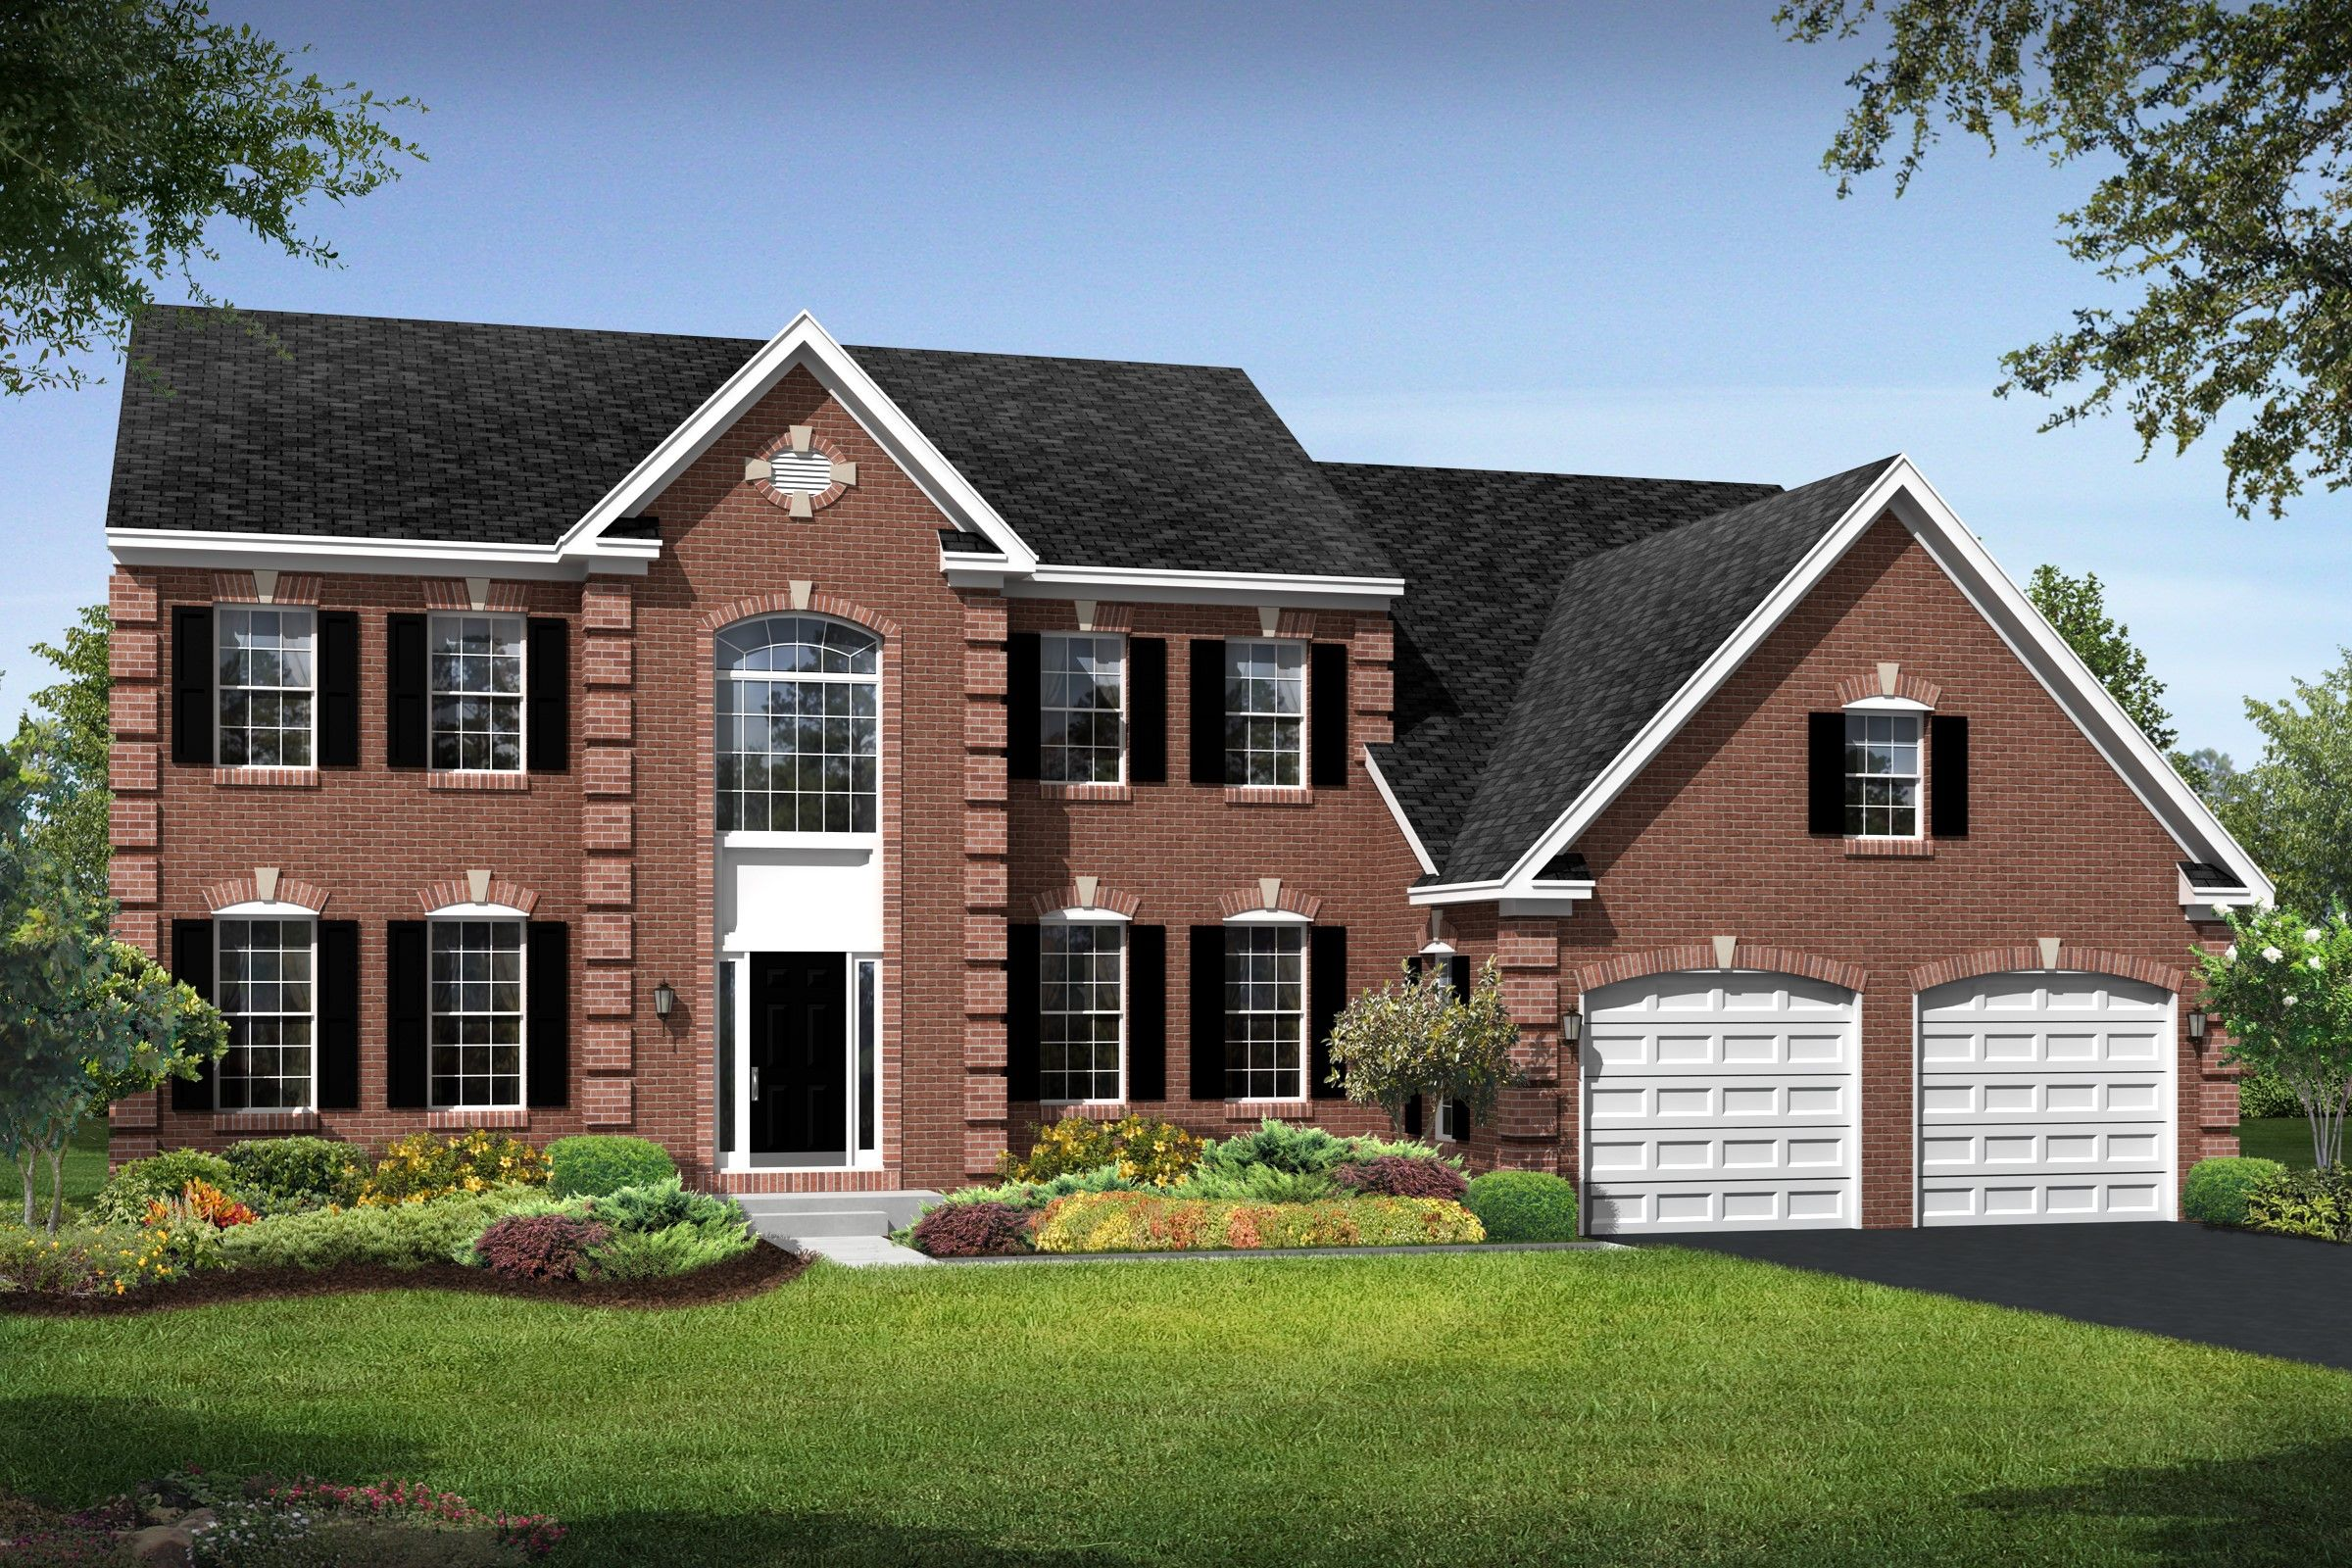 843 Ashby Drive, Homesite 45, Middletown, DE Homes & Land - Real Estate